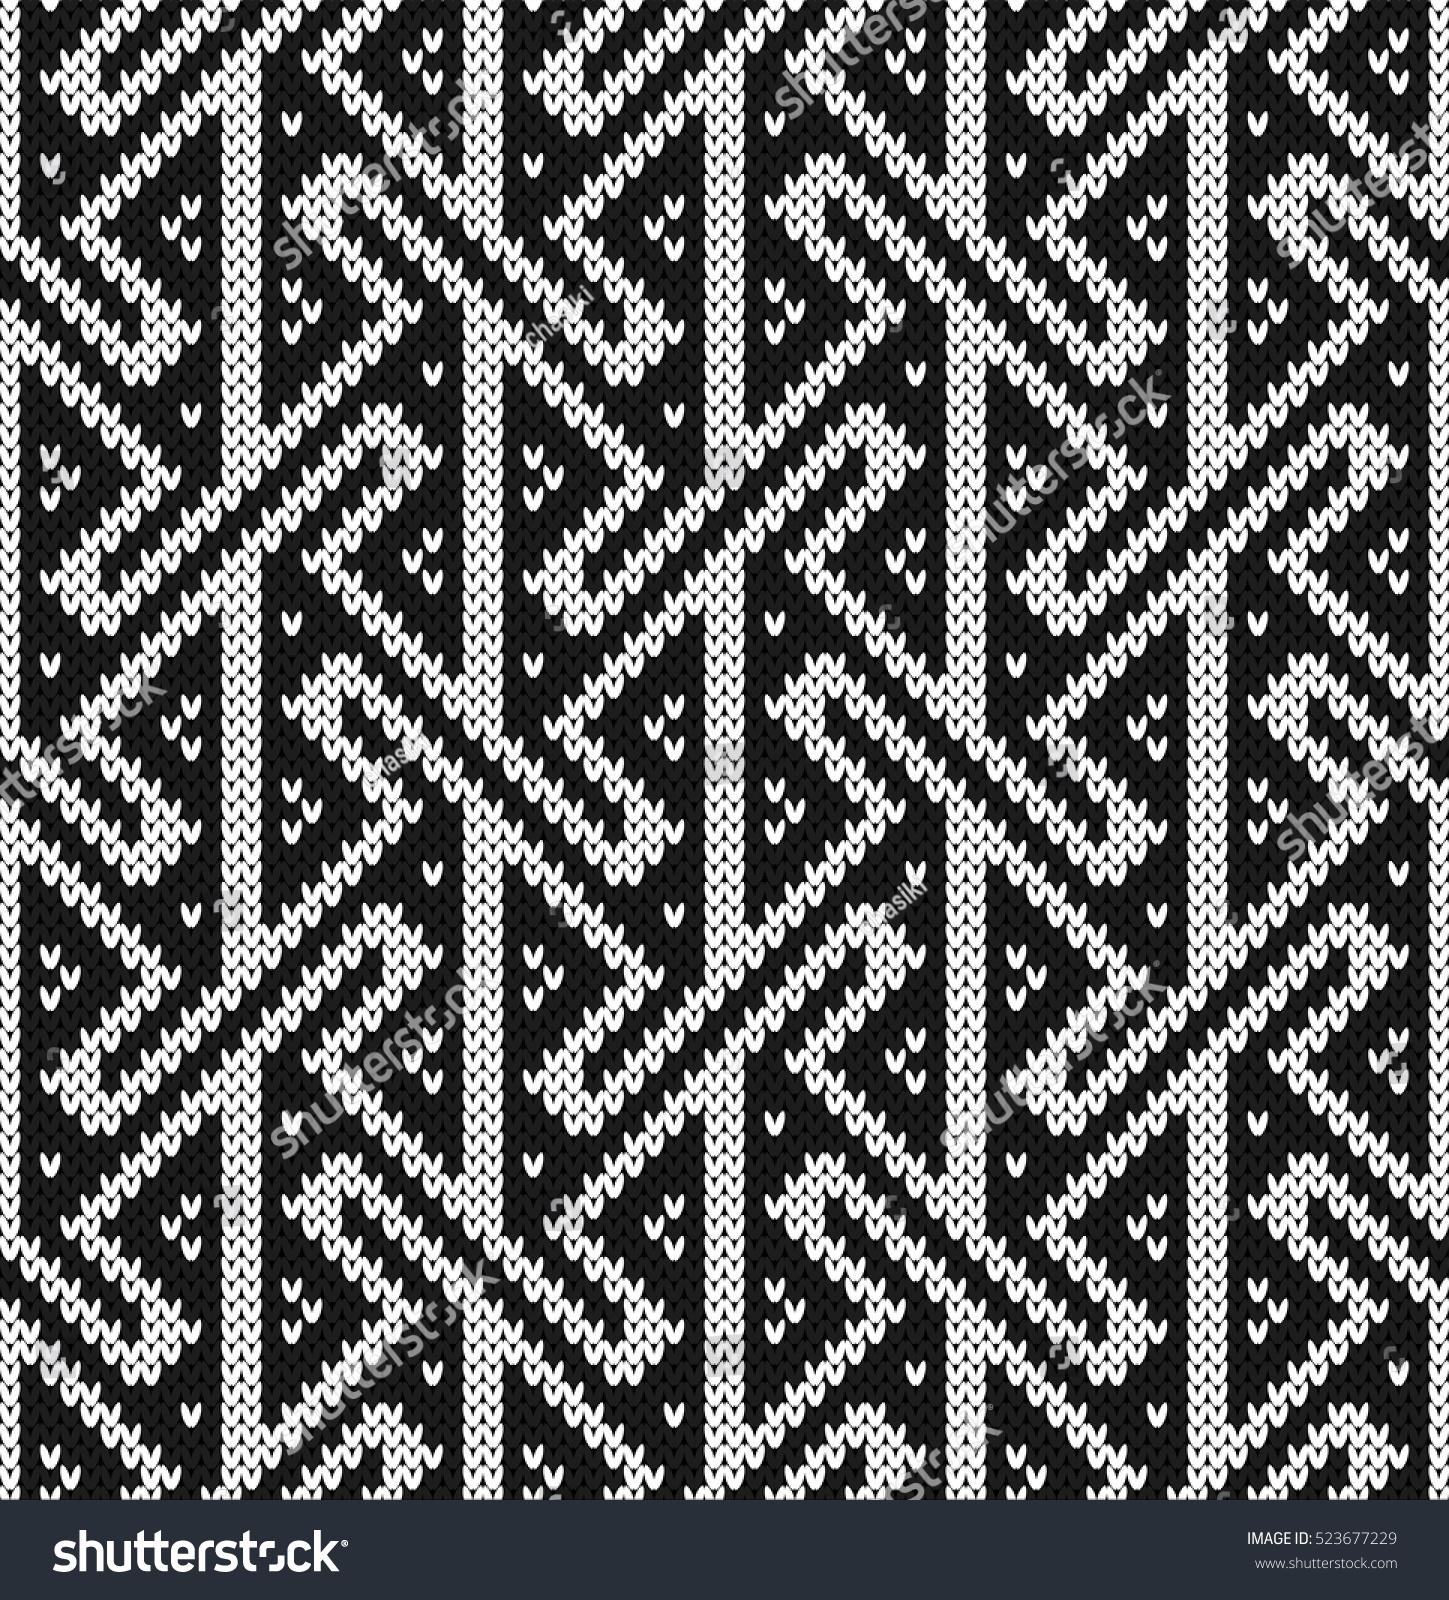 Key Seamless Knitting Pattern Stock Vector 523677229 - Shutterstock